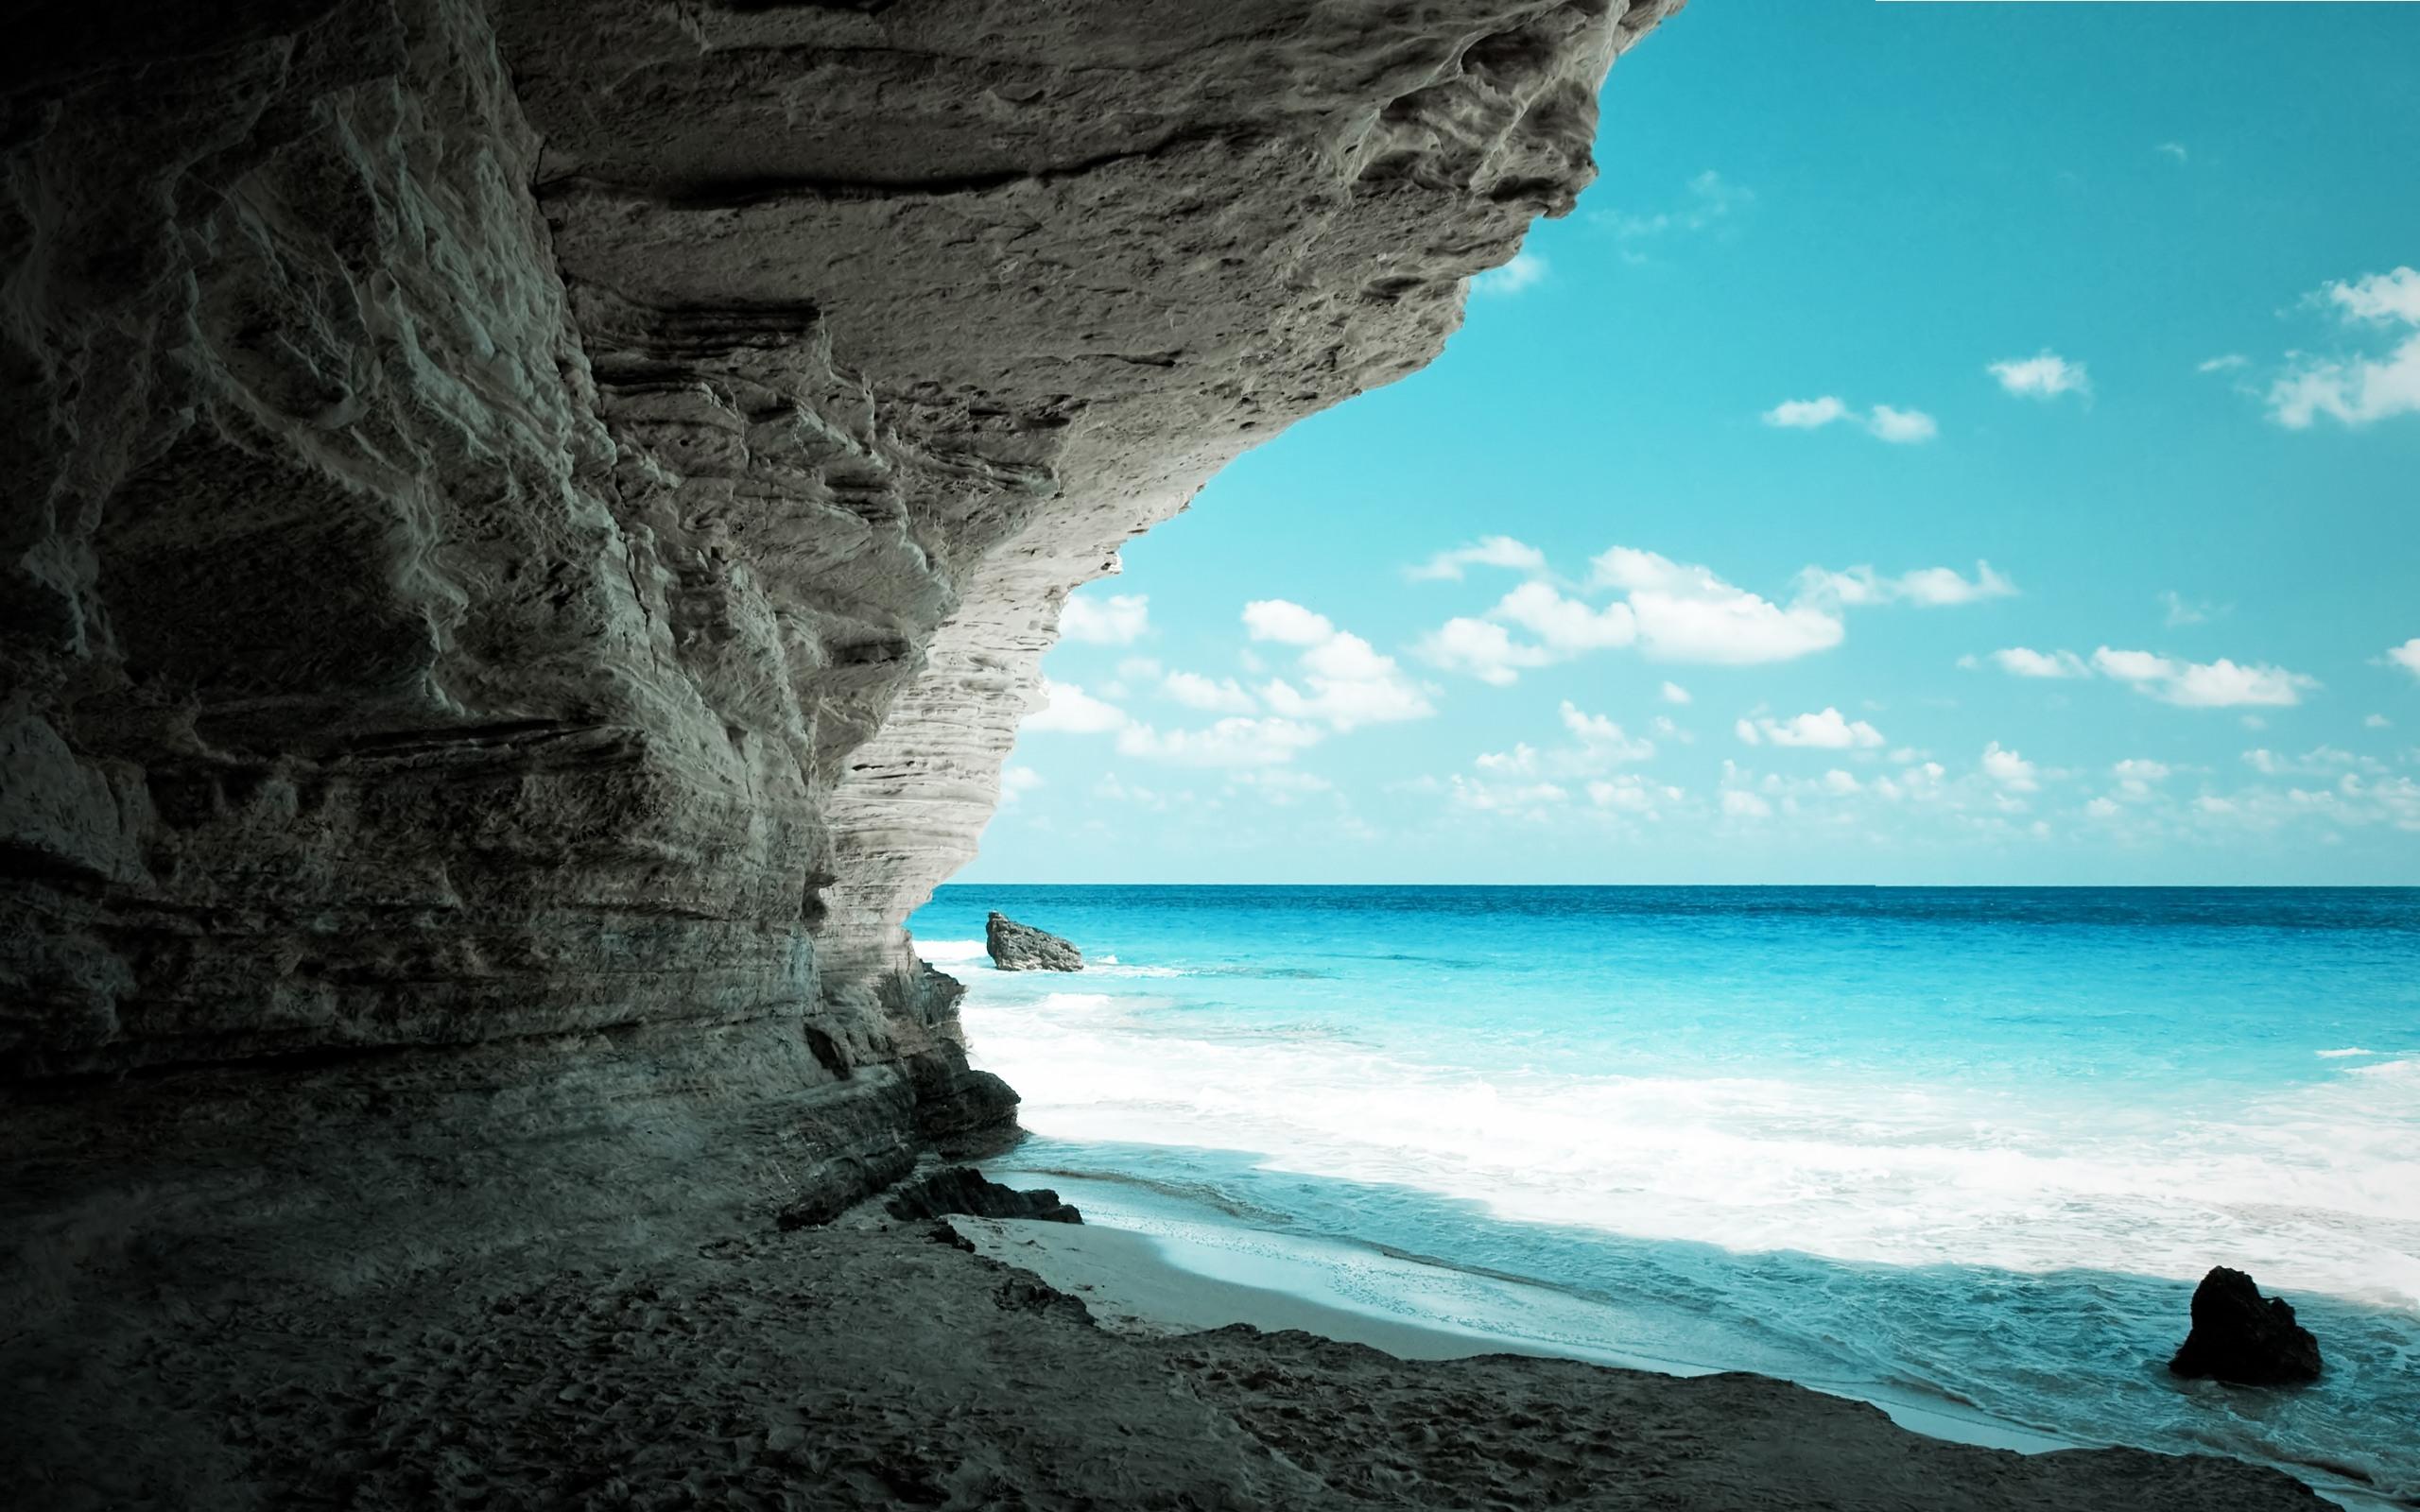 Jamaica Beach Wallpaper Ageeba beach wallpaper 2560x1600